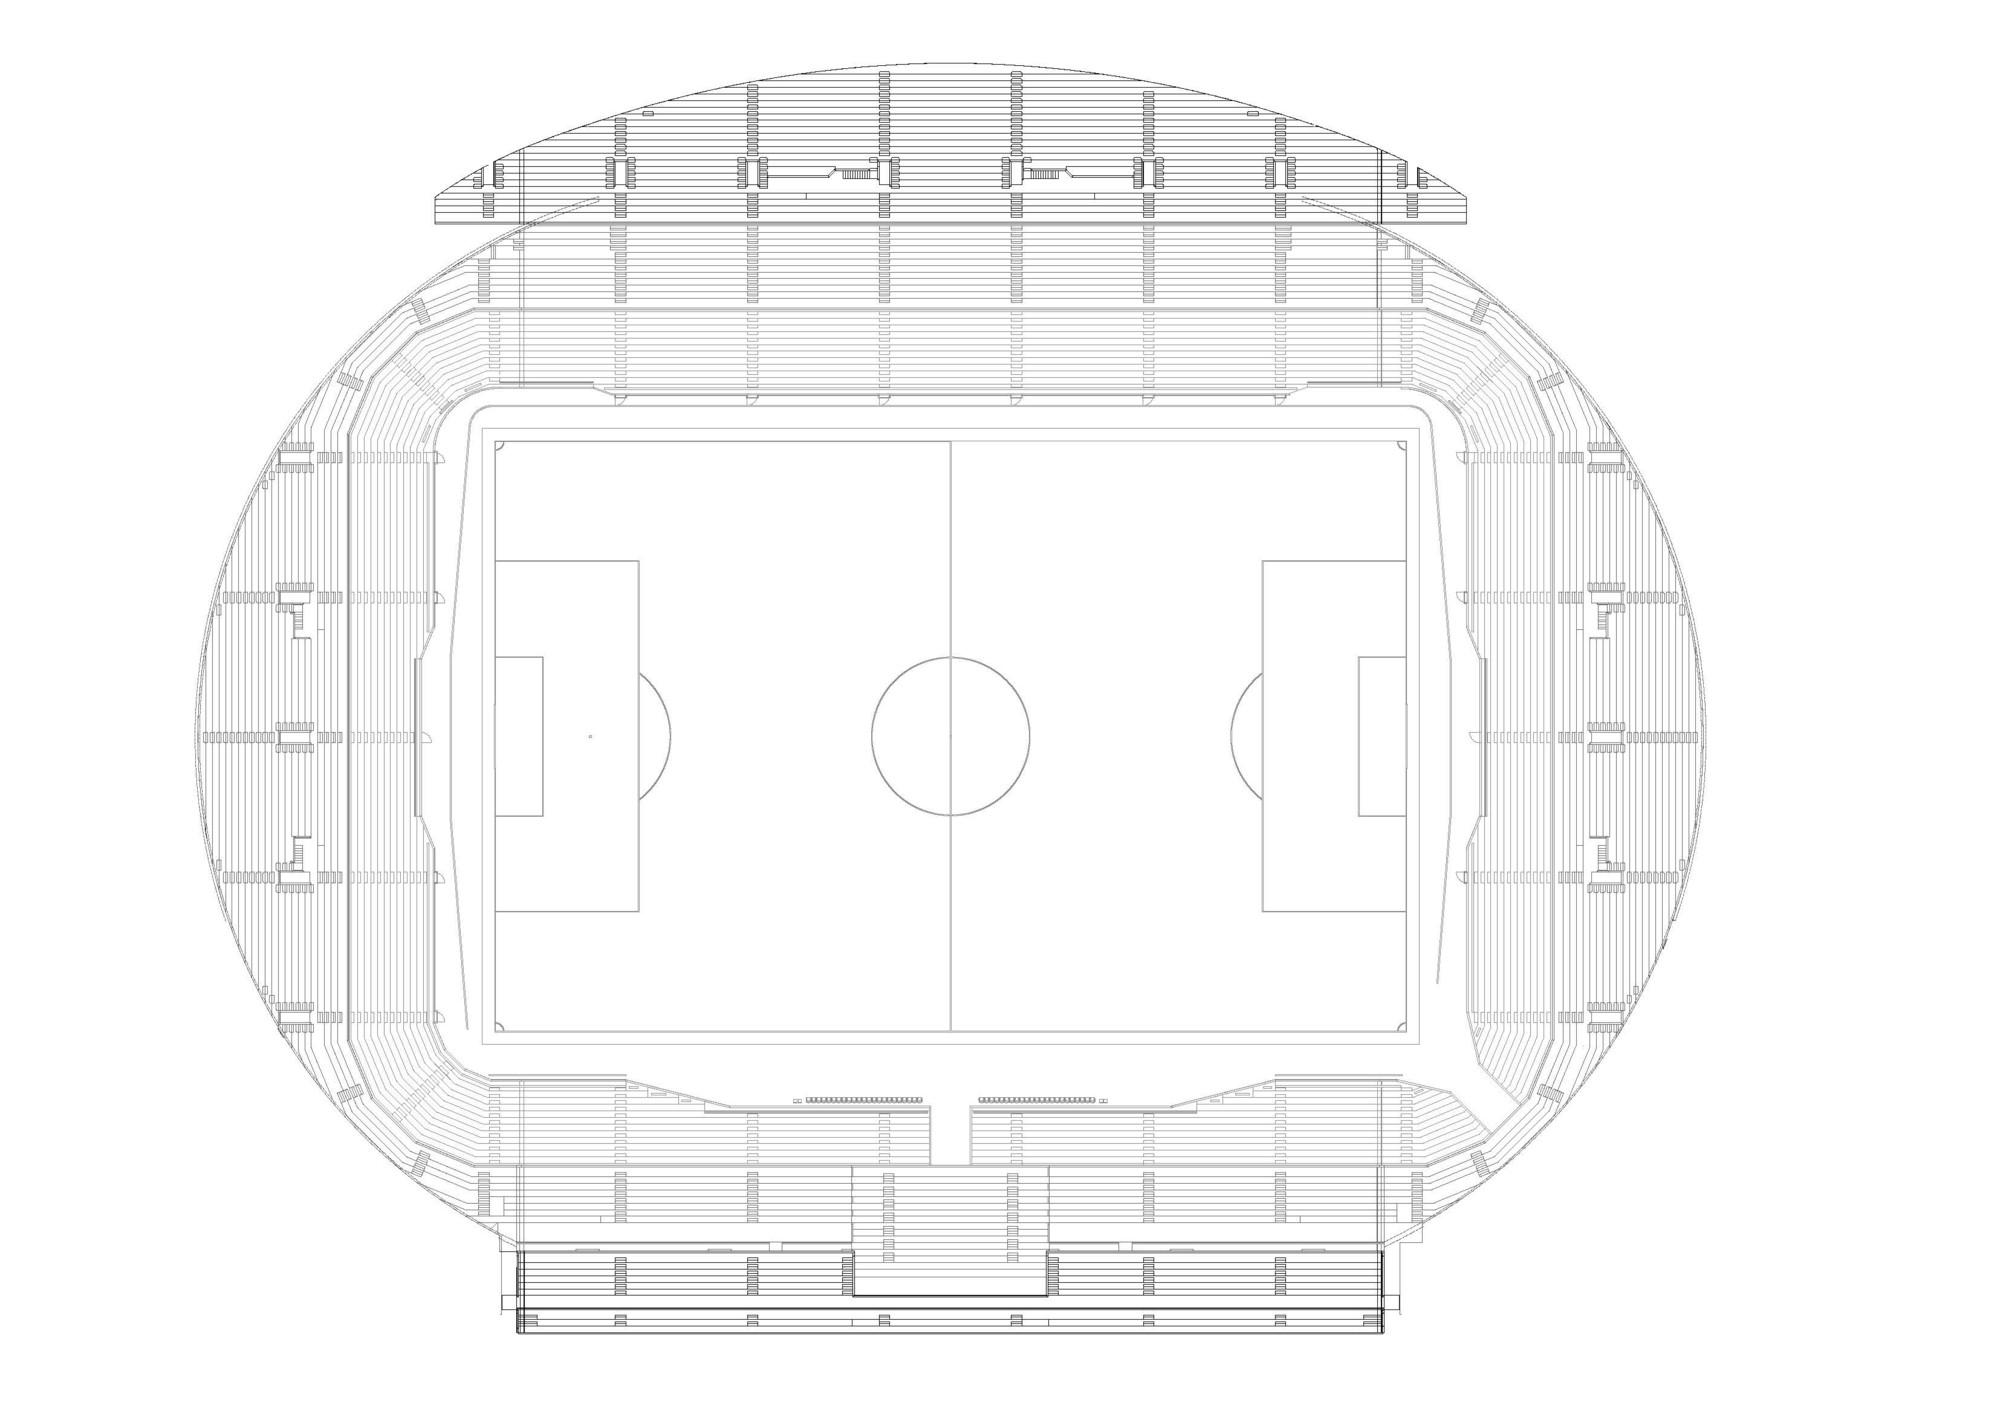 Gallery of Hazza Bin Zayed Stadium / Pattern Design - 12